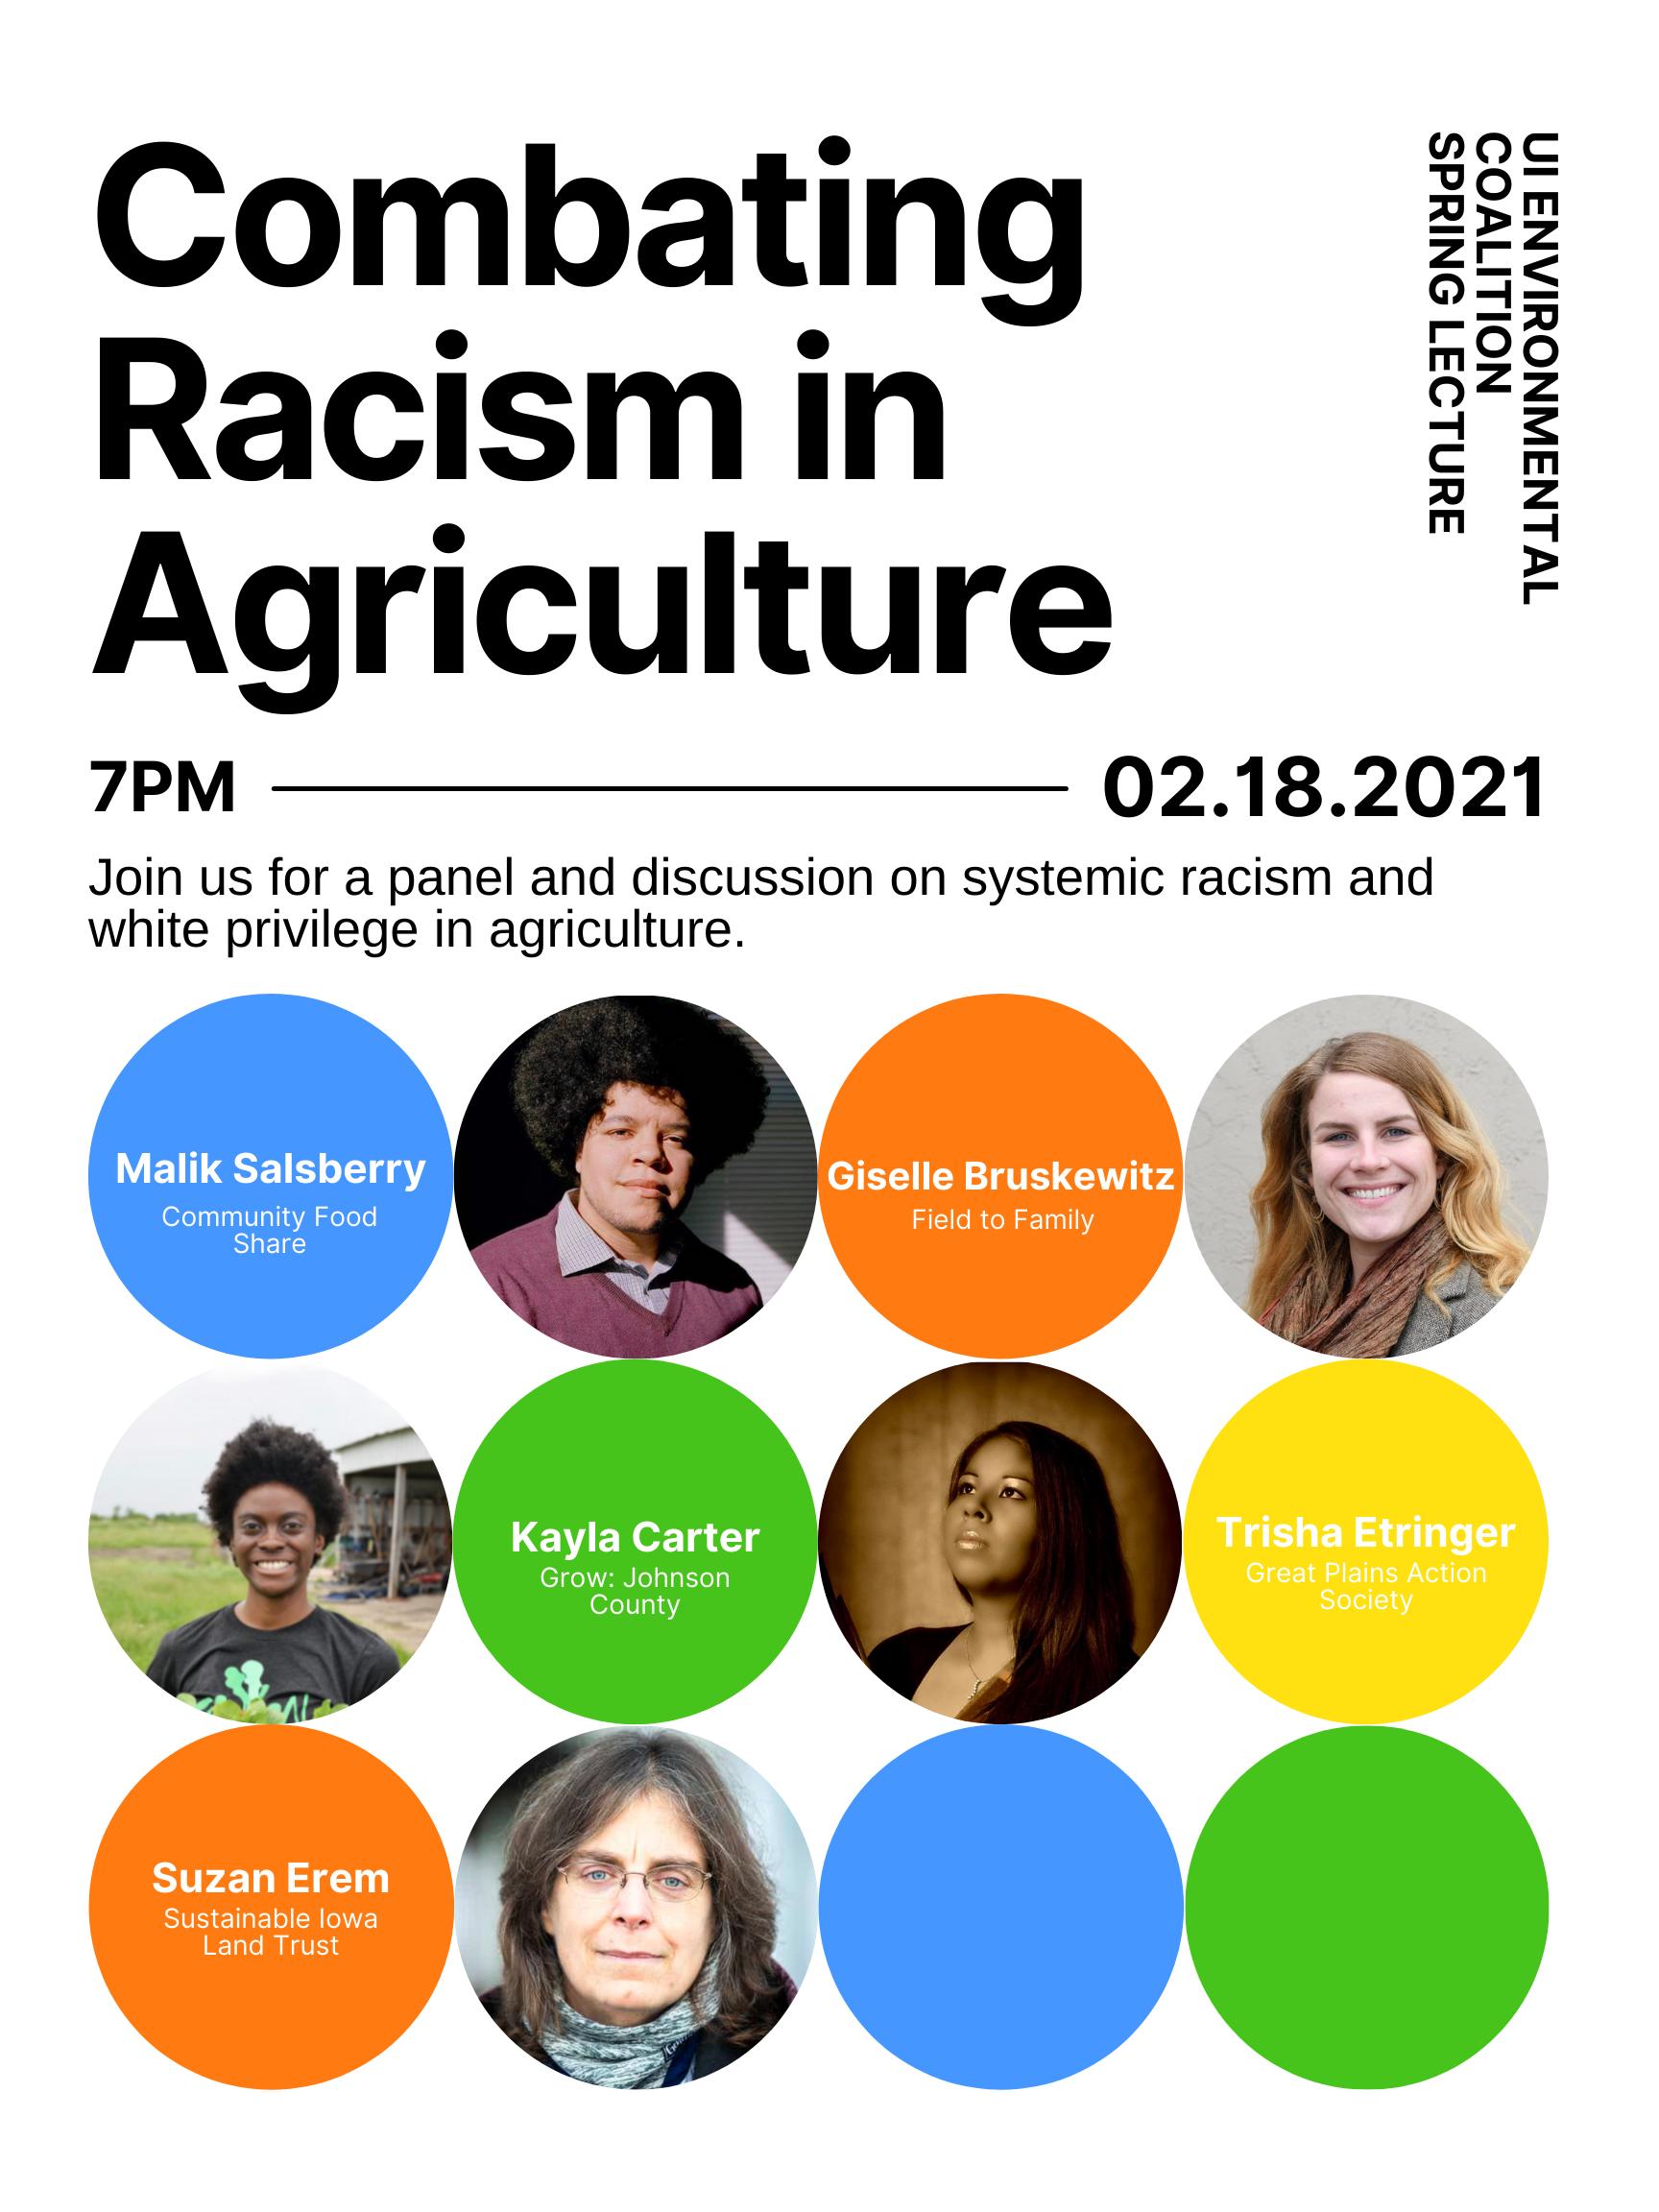 Combating Racism in Agriculture Poster. Pictures of lecturers: Malik Salsberry, Giselle Bruskewitz, Kayla Carter, Trisha Etringer, Suzan Erem